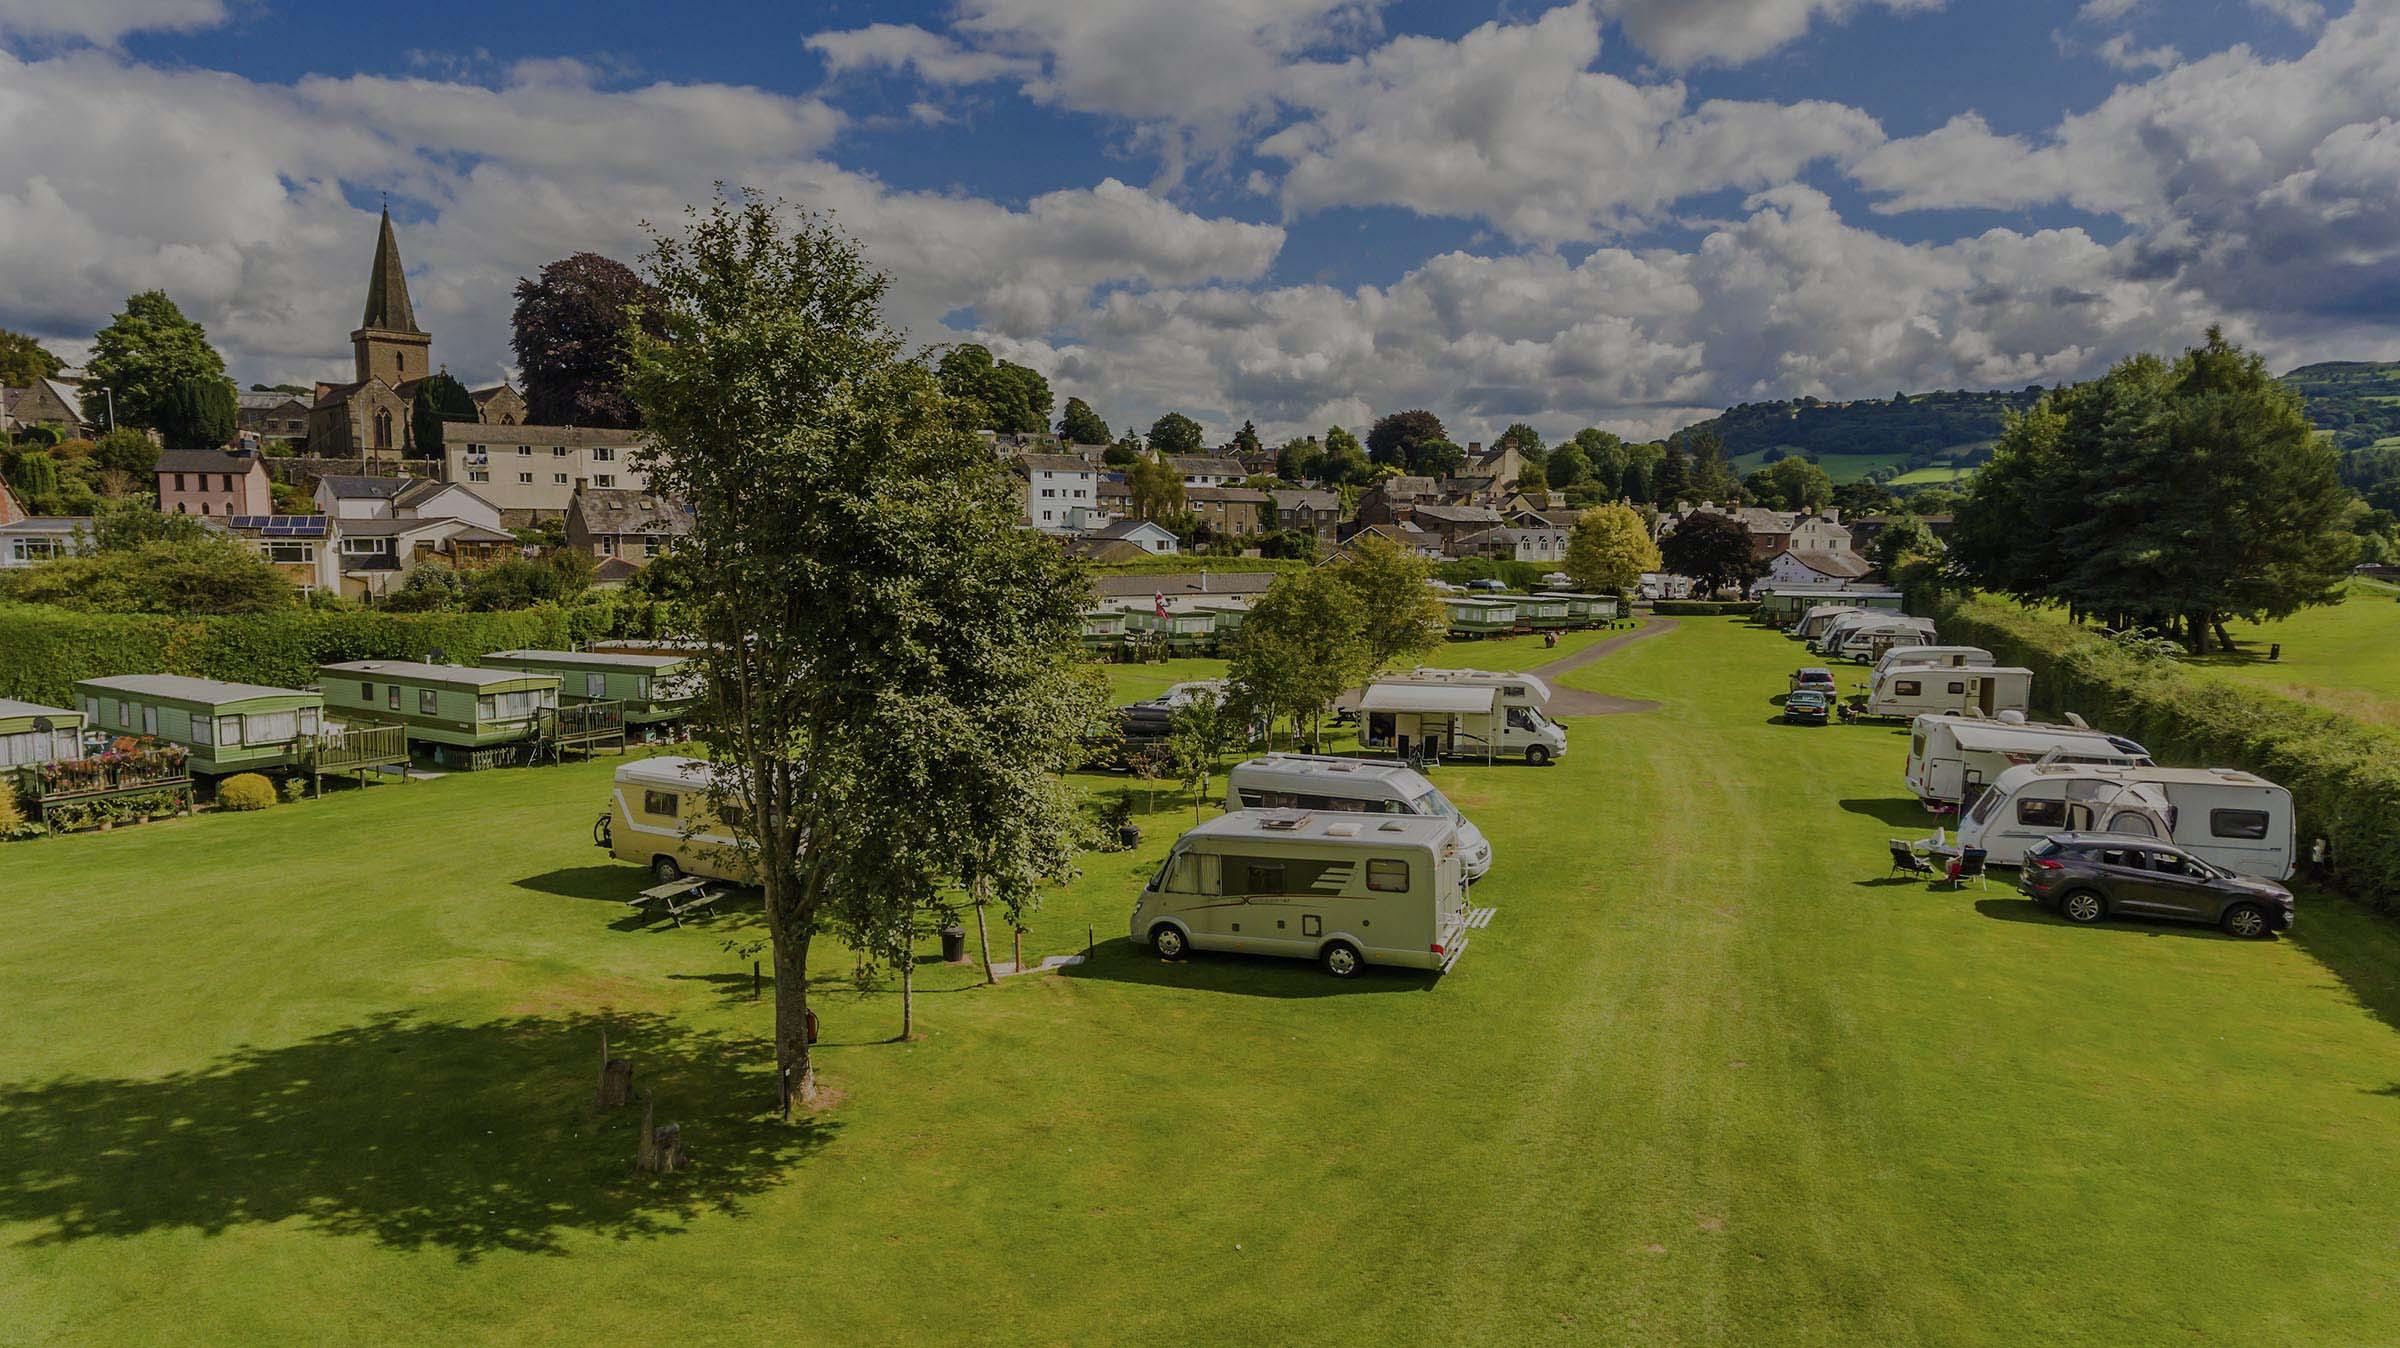 Riverside Caravan & Camping Park in Crickhowell, Wales